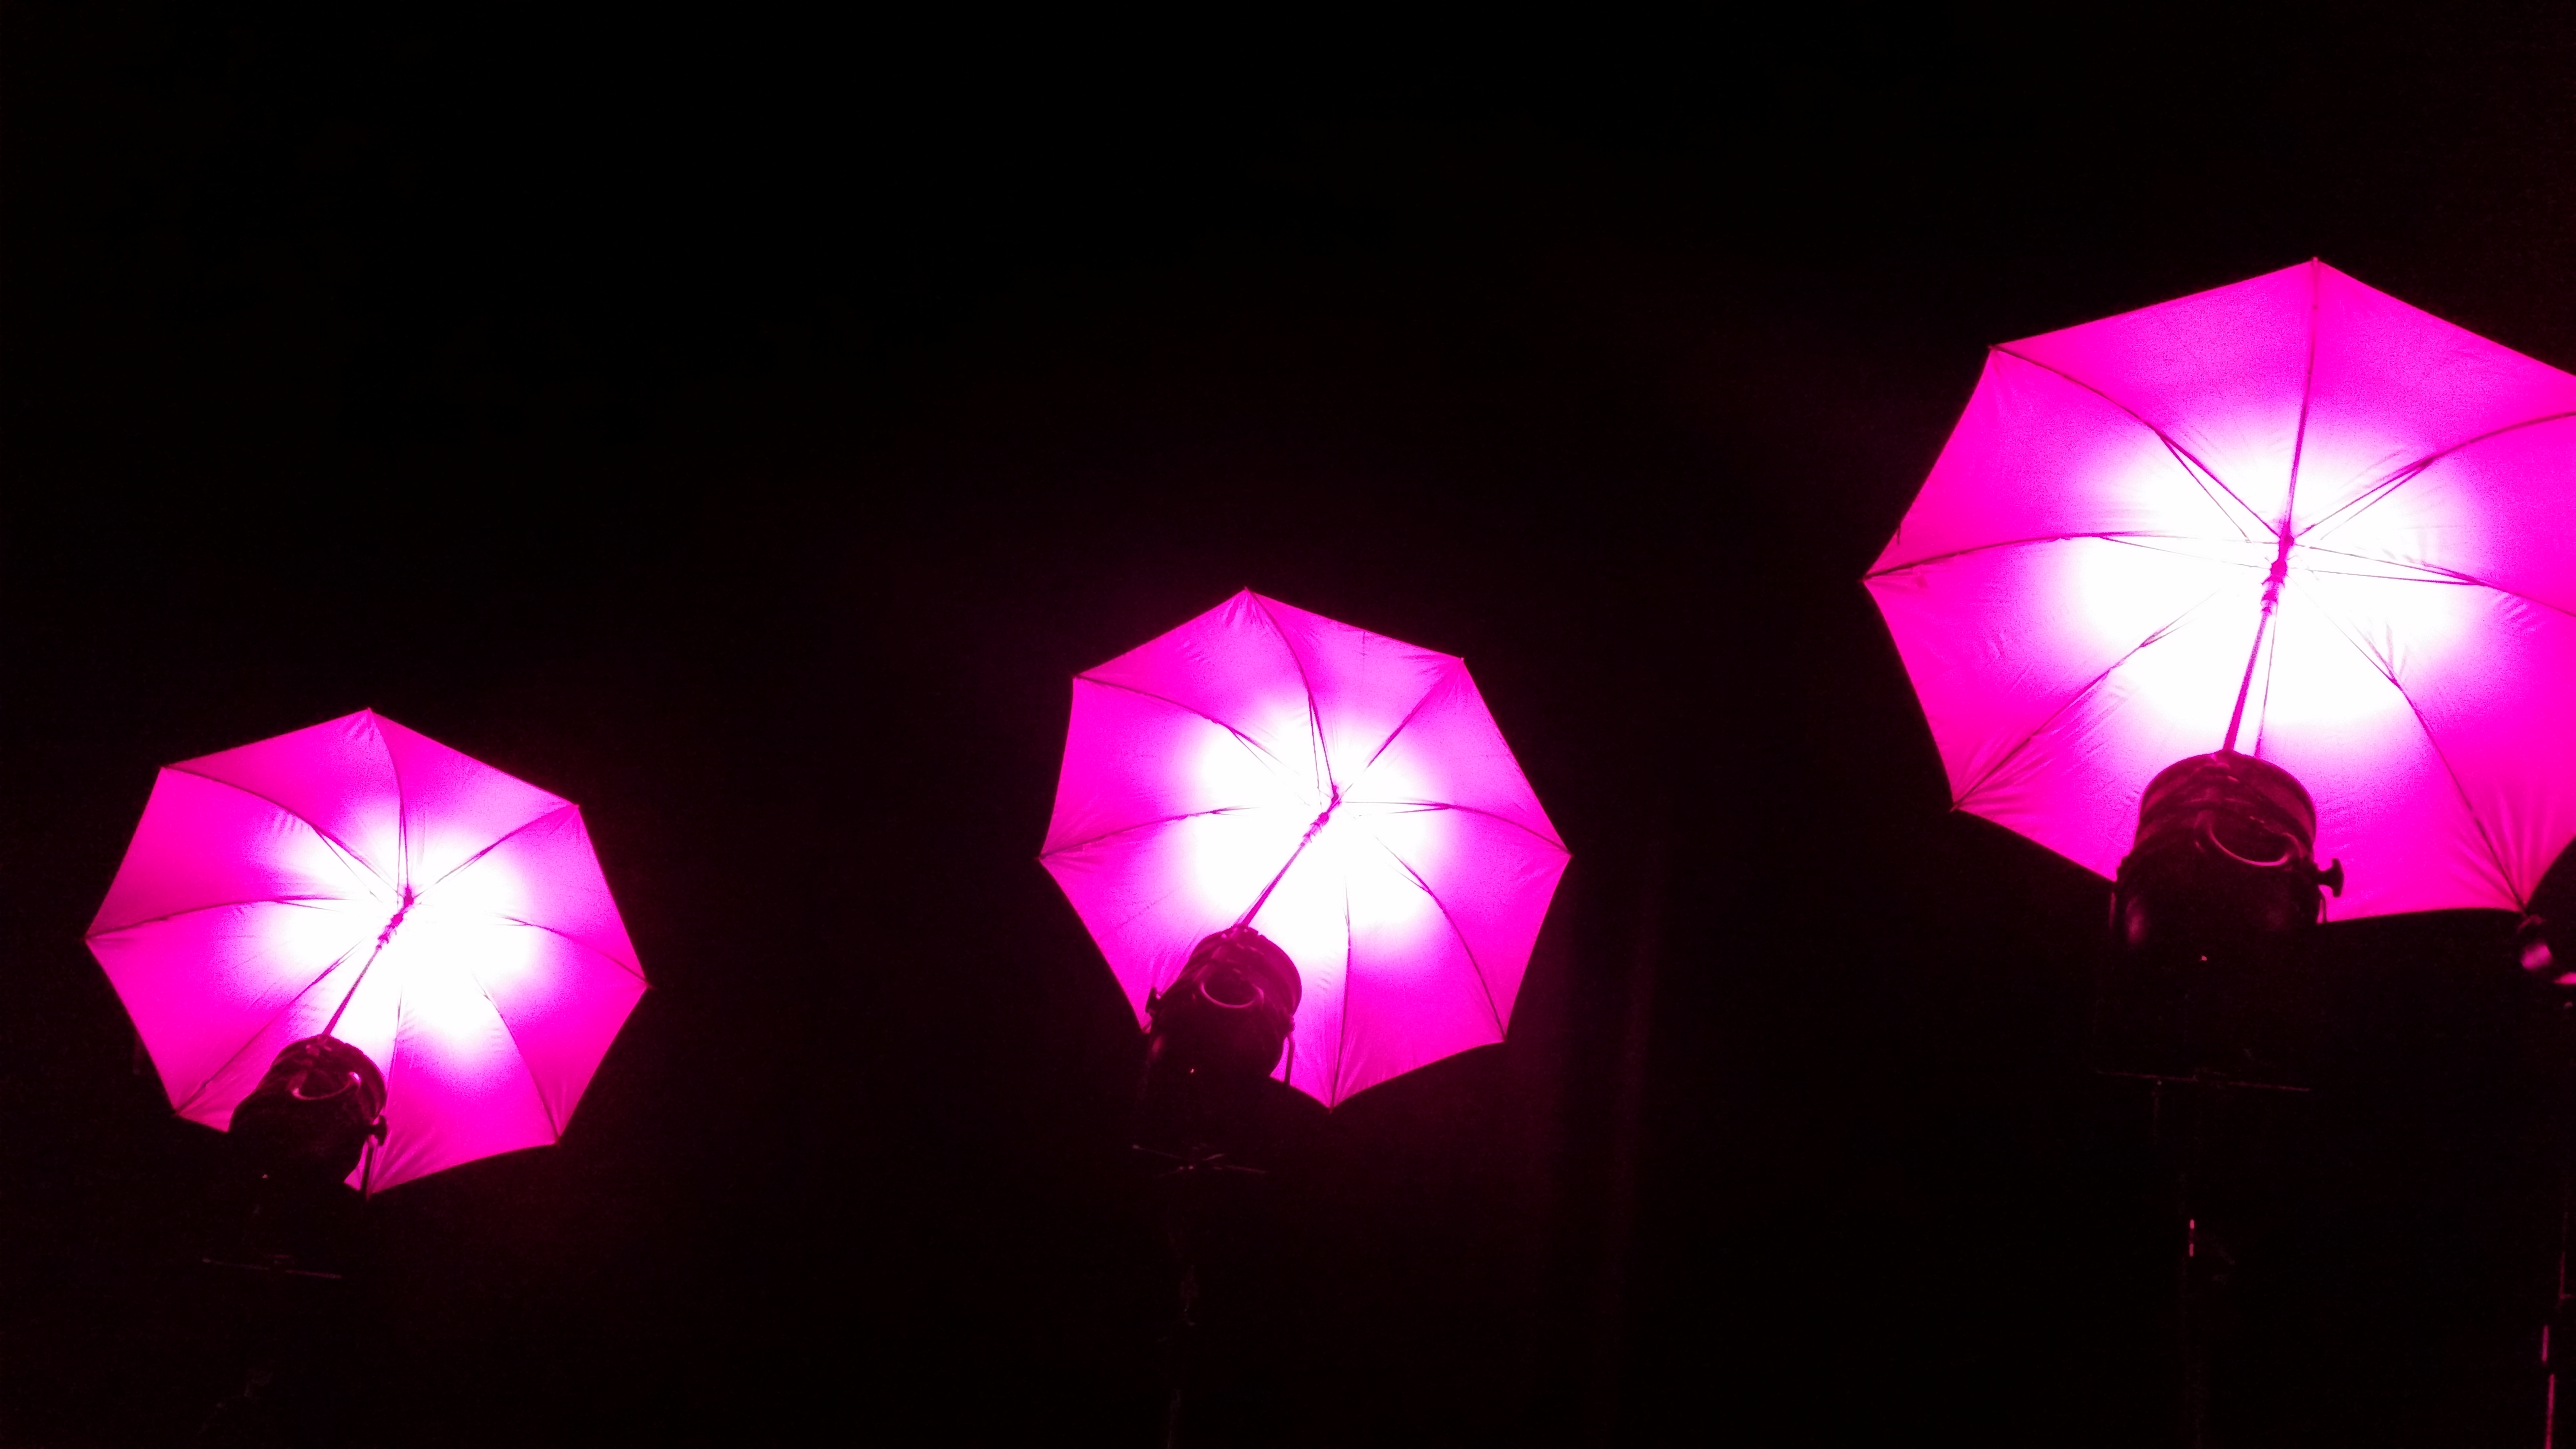 Neue LED Schirme als Designelemente 7